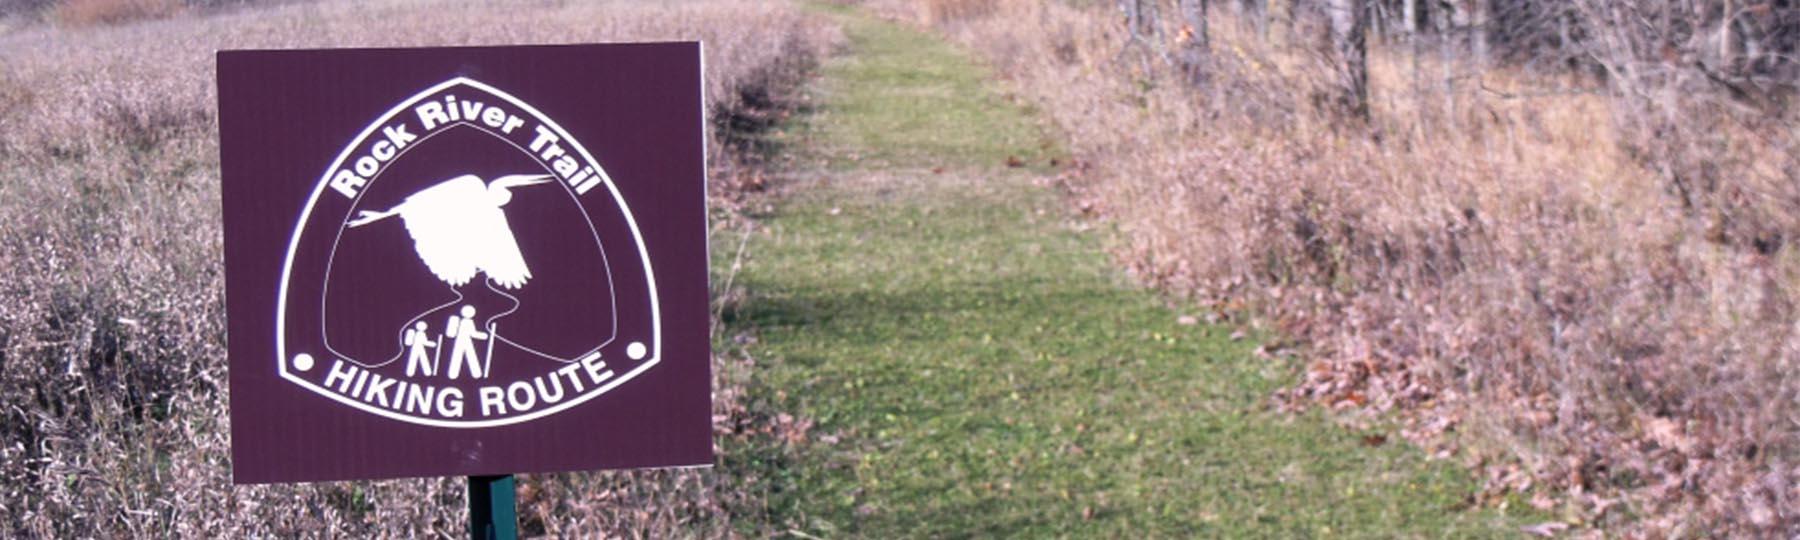 Rock River Trail Scenic and Historic Route Wisconsin Illinois 2